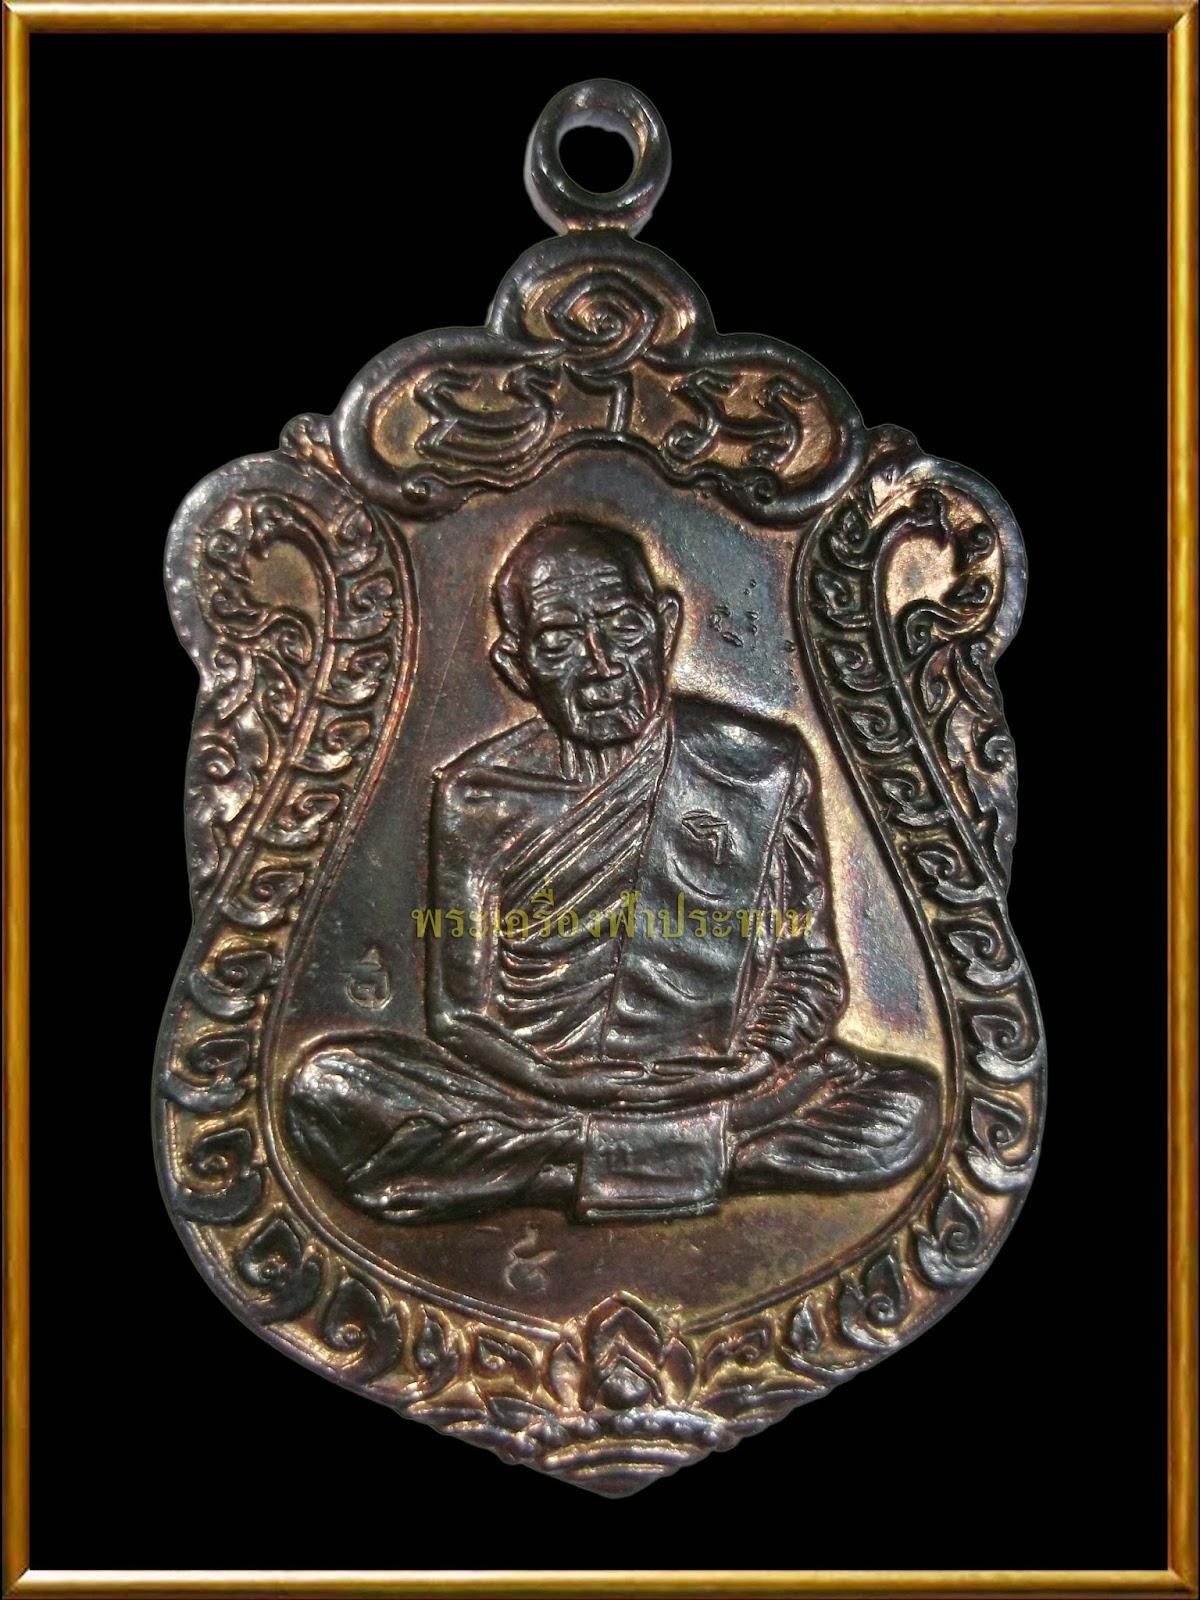 http://tubtimthong-amulet.blogspot.com/2014/10/8.html